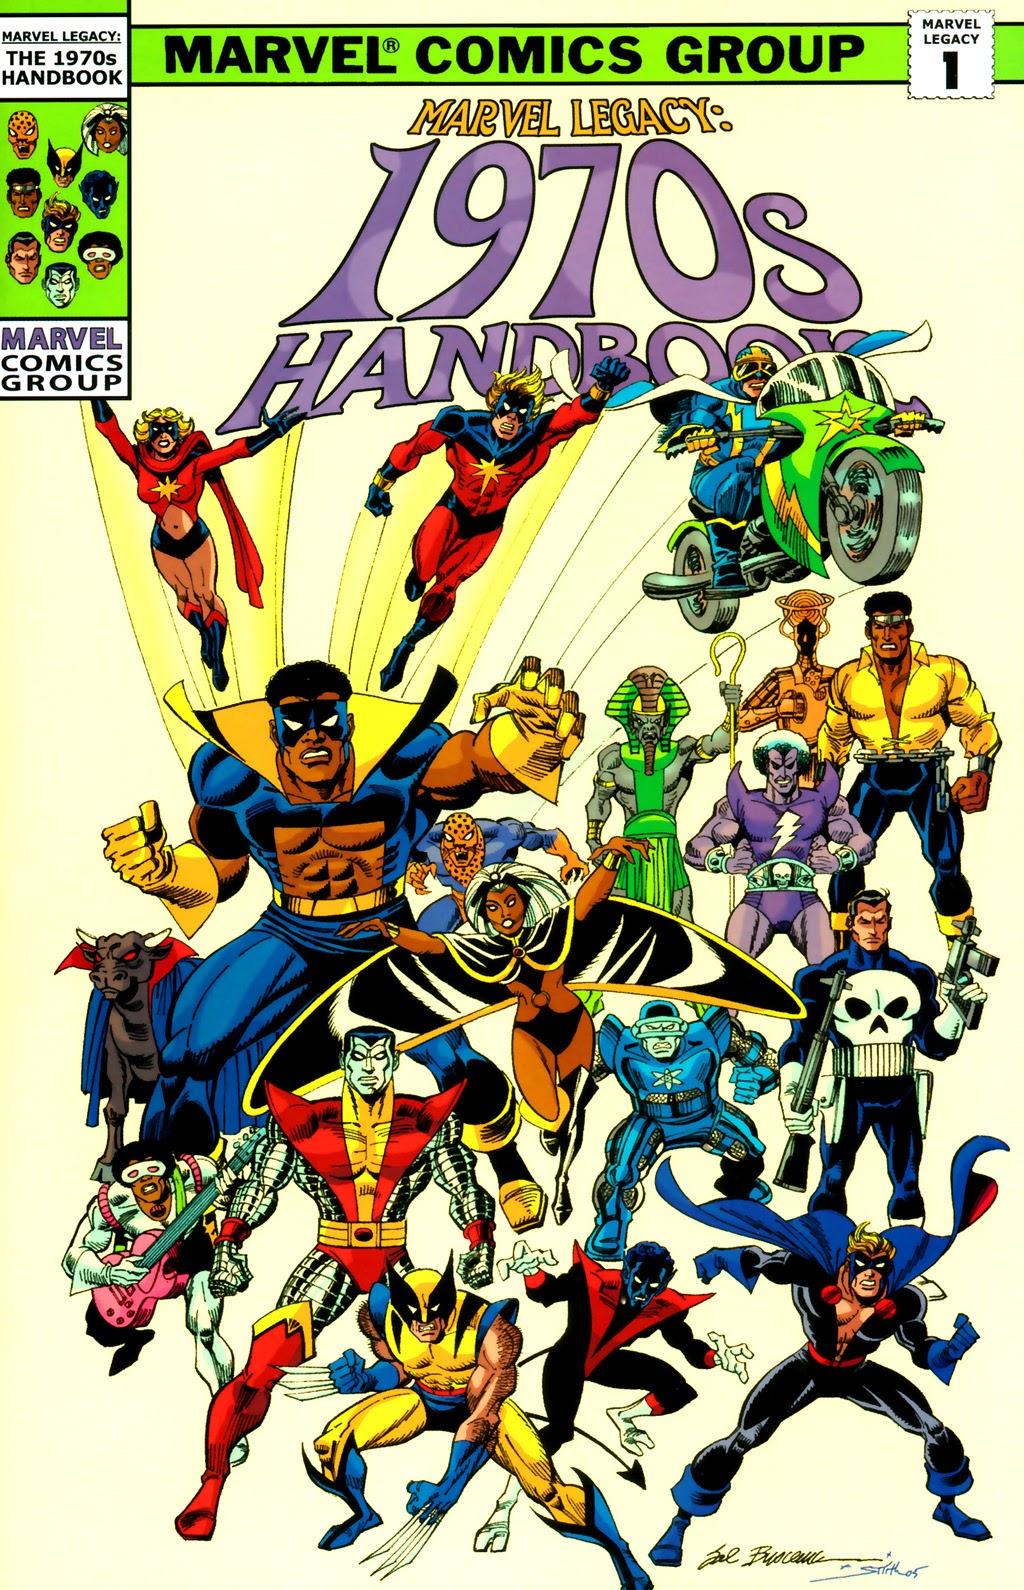 Read online Marvel Legacy: The 1970's Handbook comic -  Issue # Full - 1